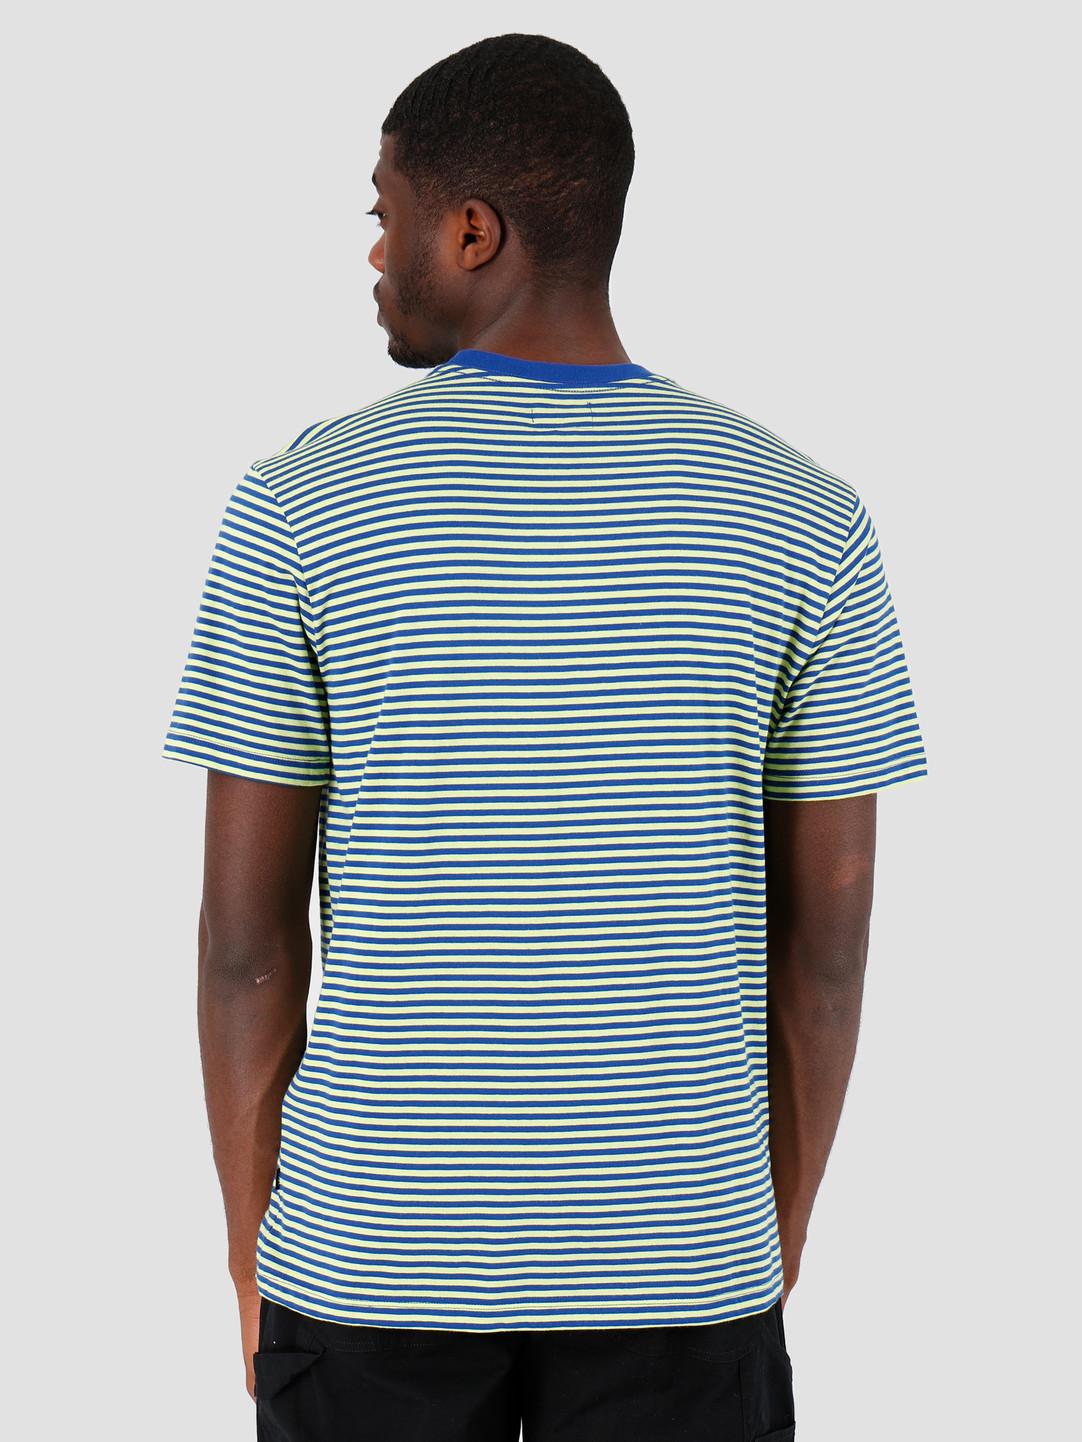 Obey Obey Apex T-Shirt Surf Blue Multi 131080182-SBL